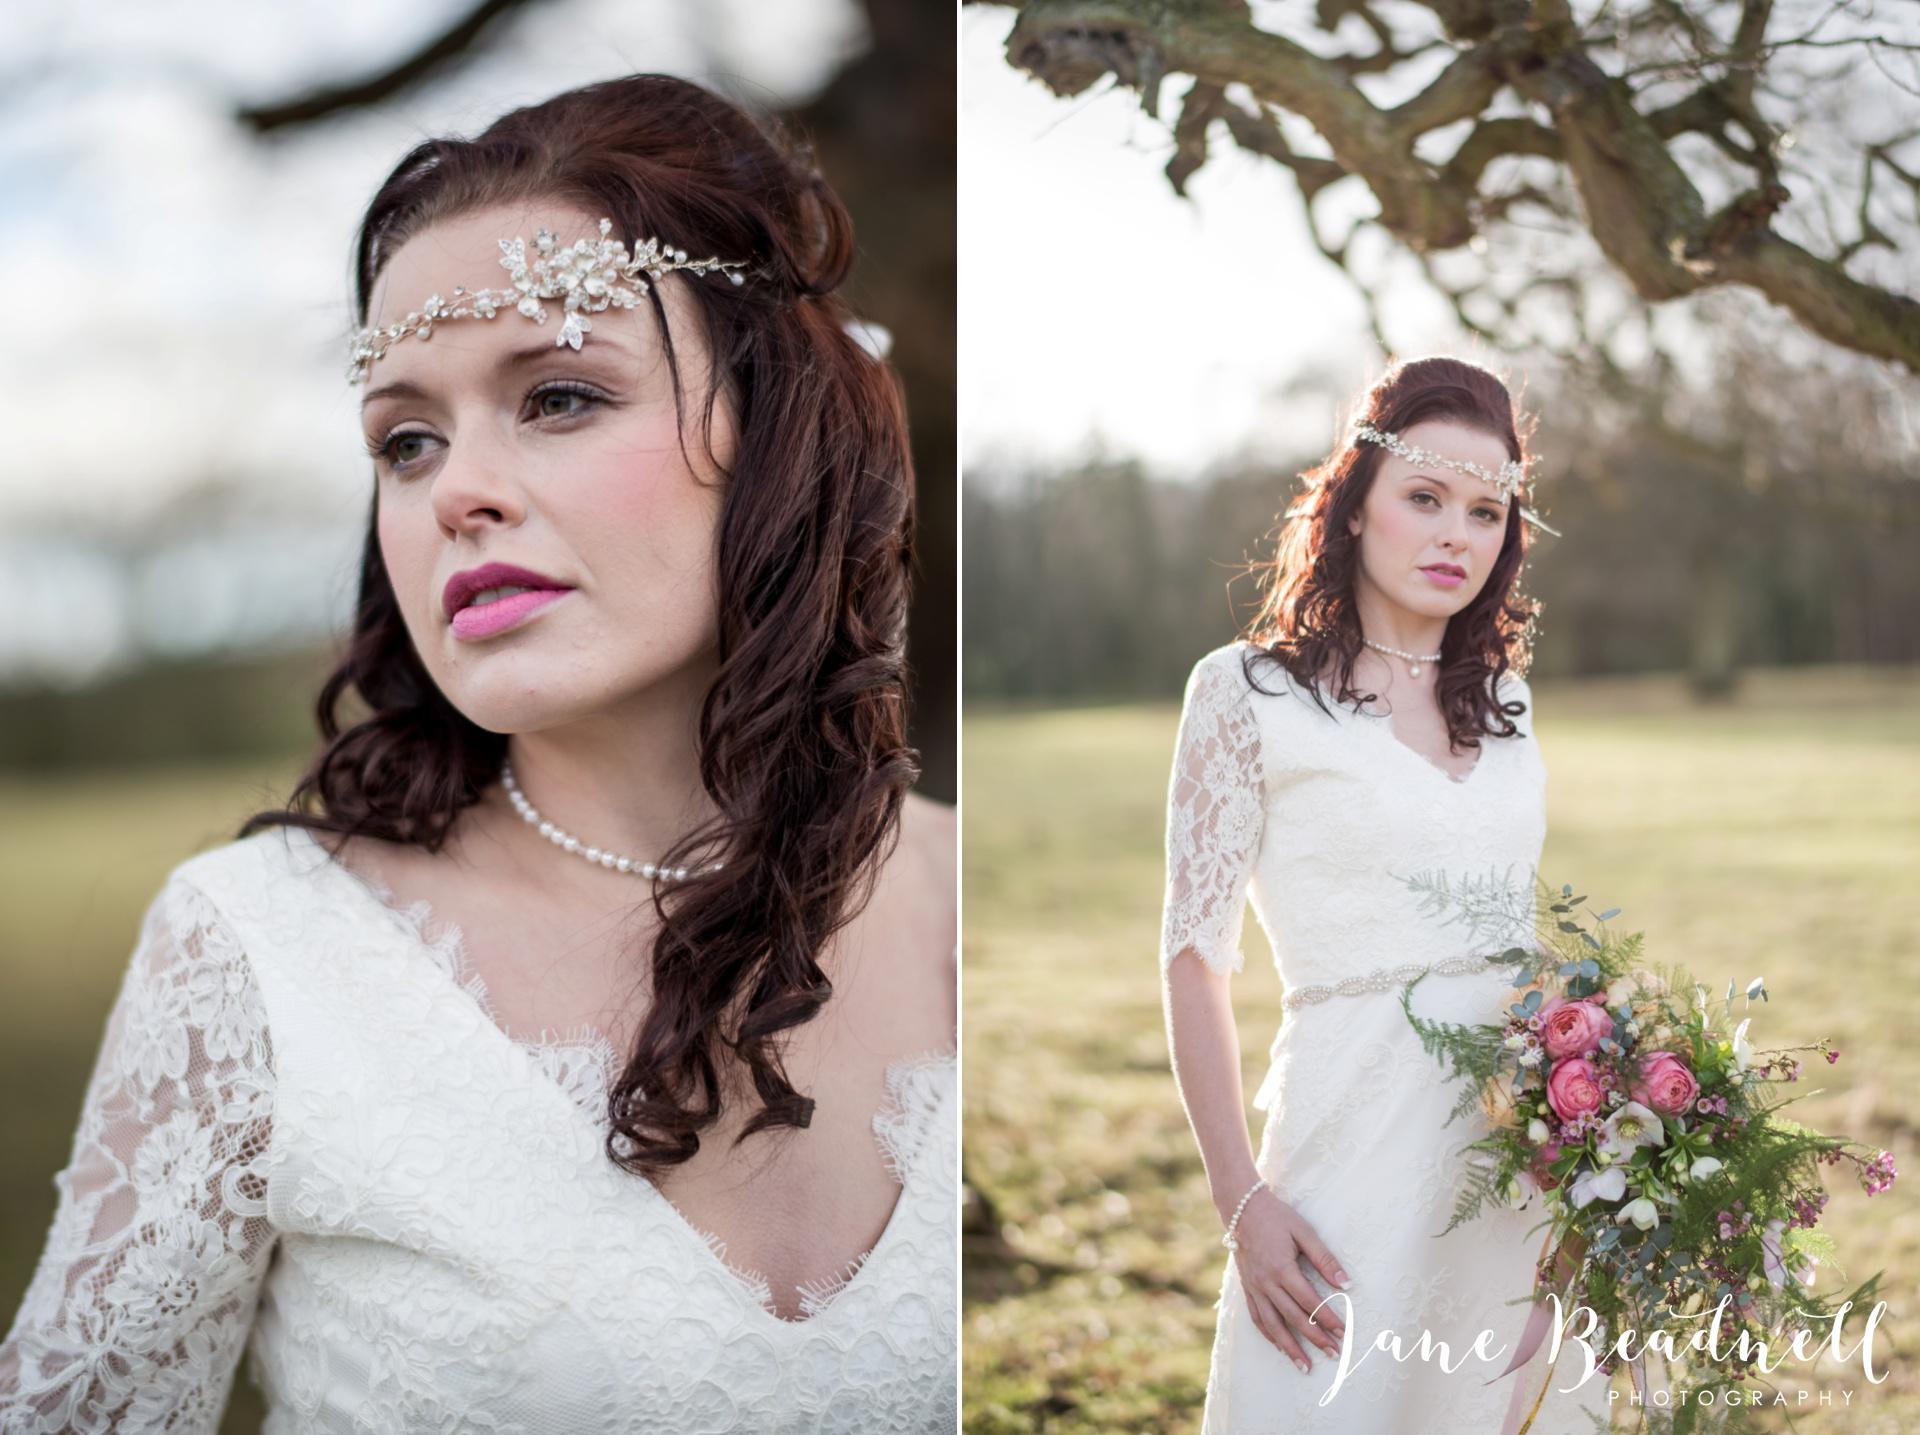 Jane Beadnell fine art wedding photographer Swinton Park17